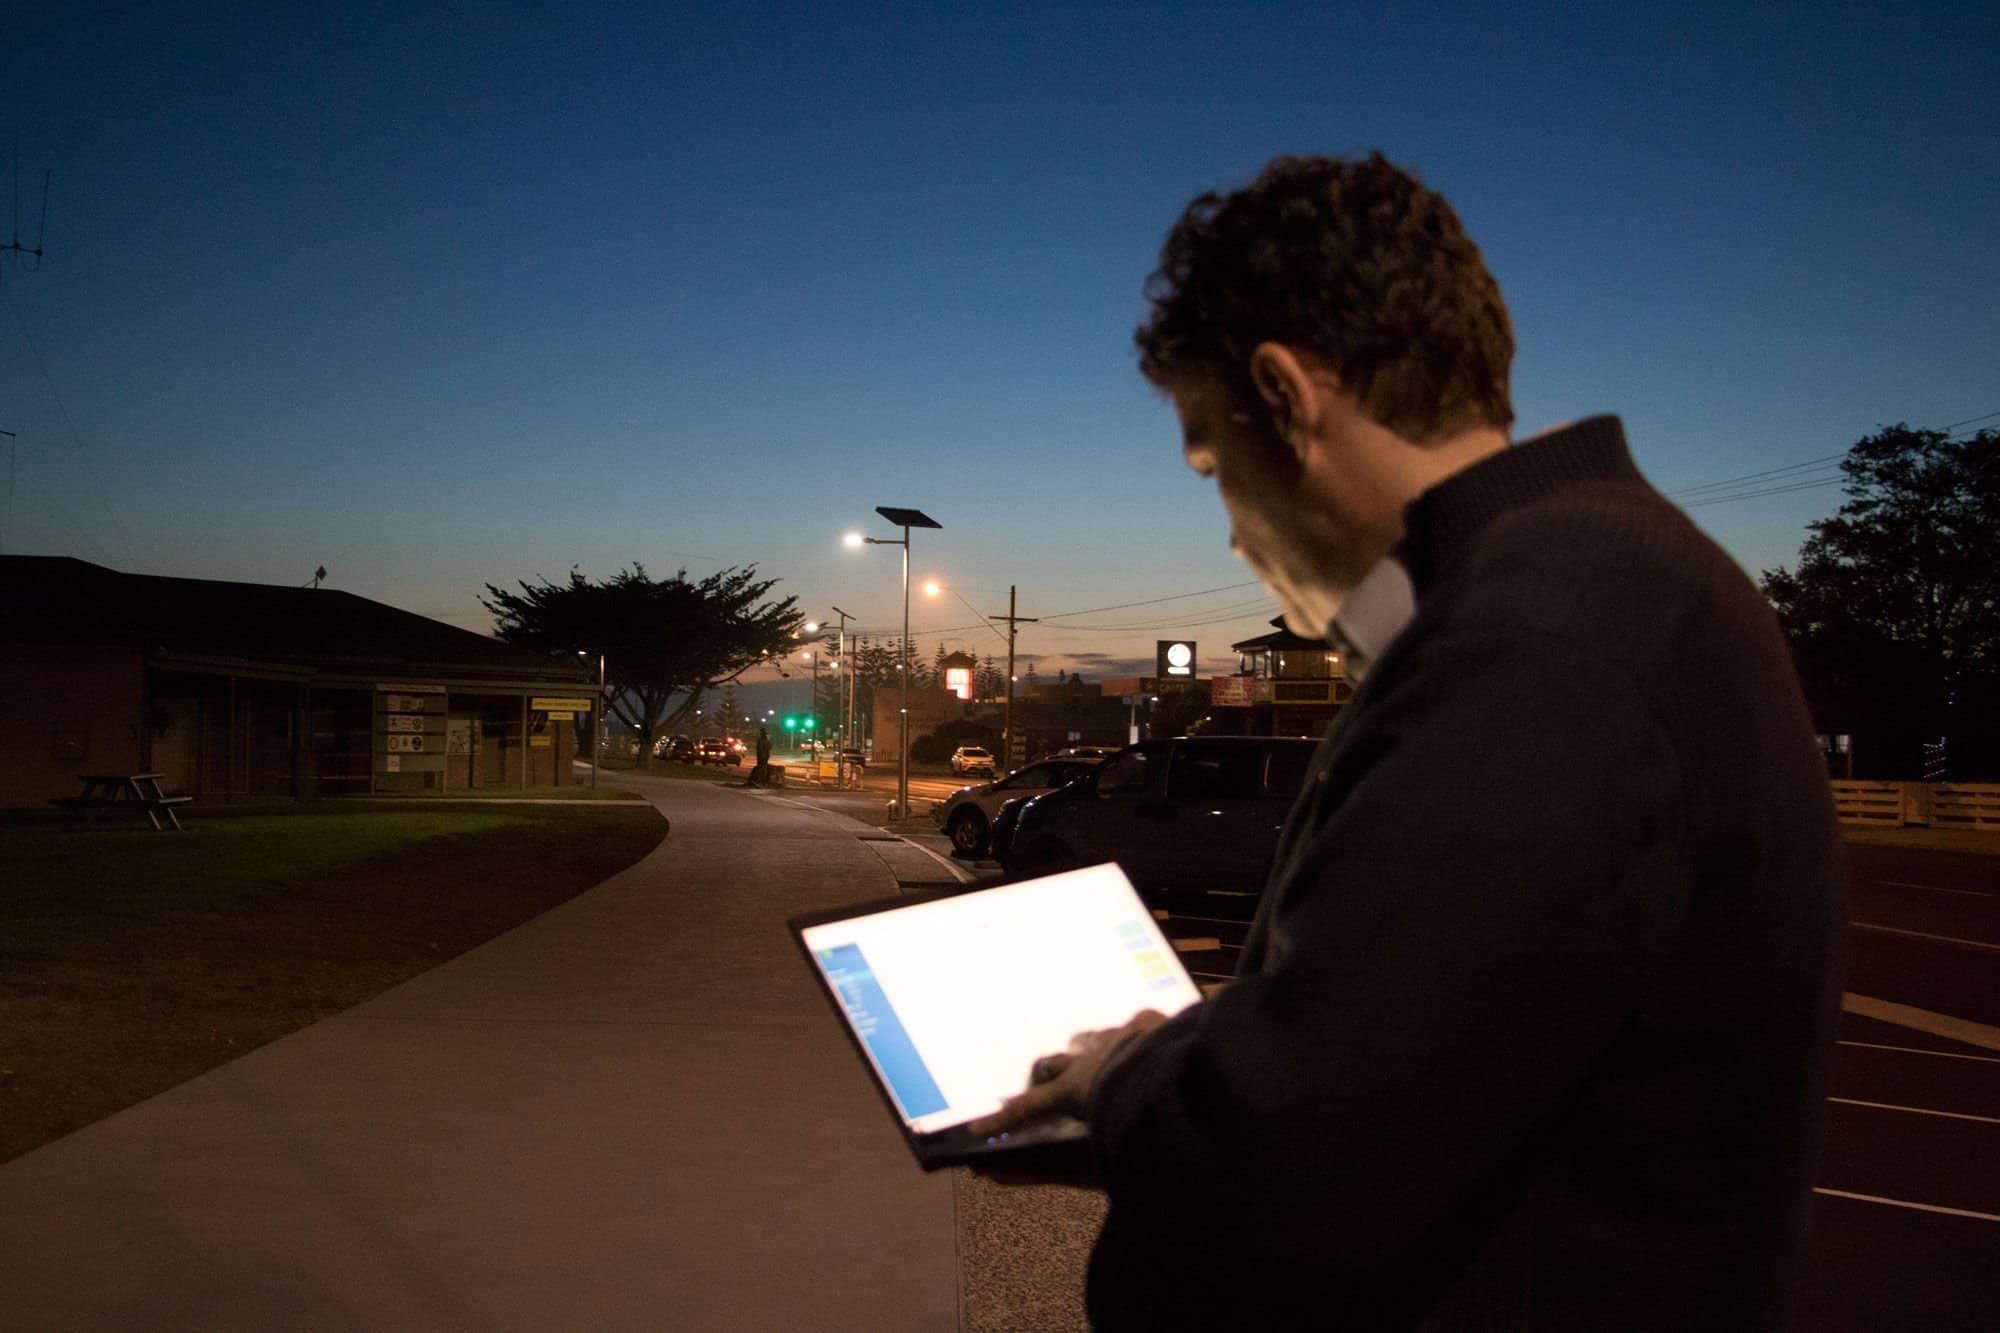 SAM solar activity monitoring and control dashboard